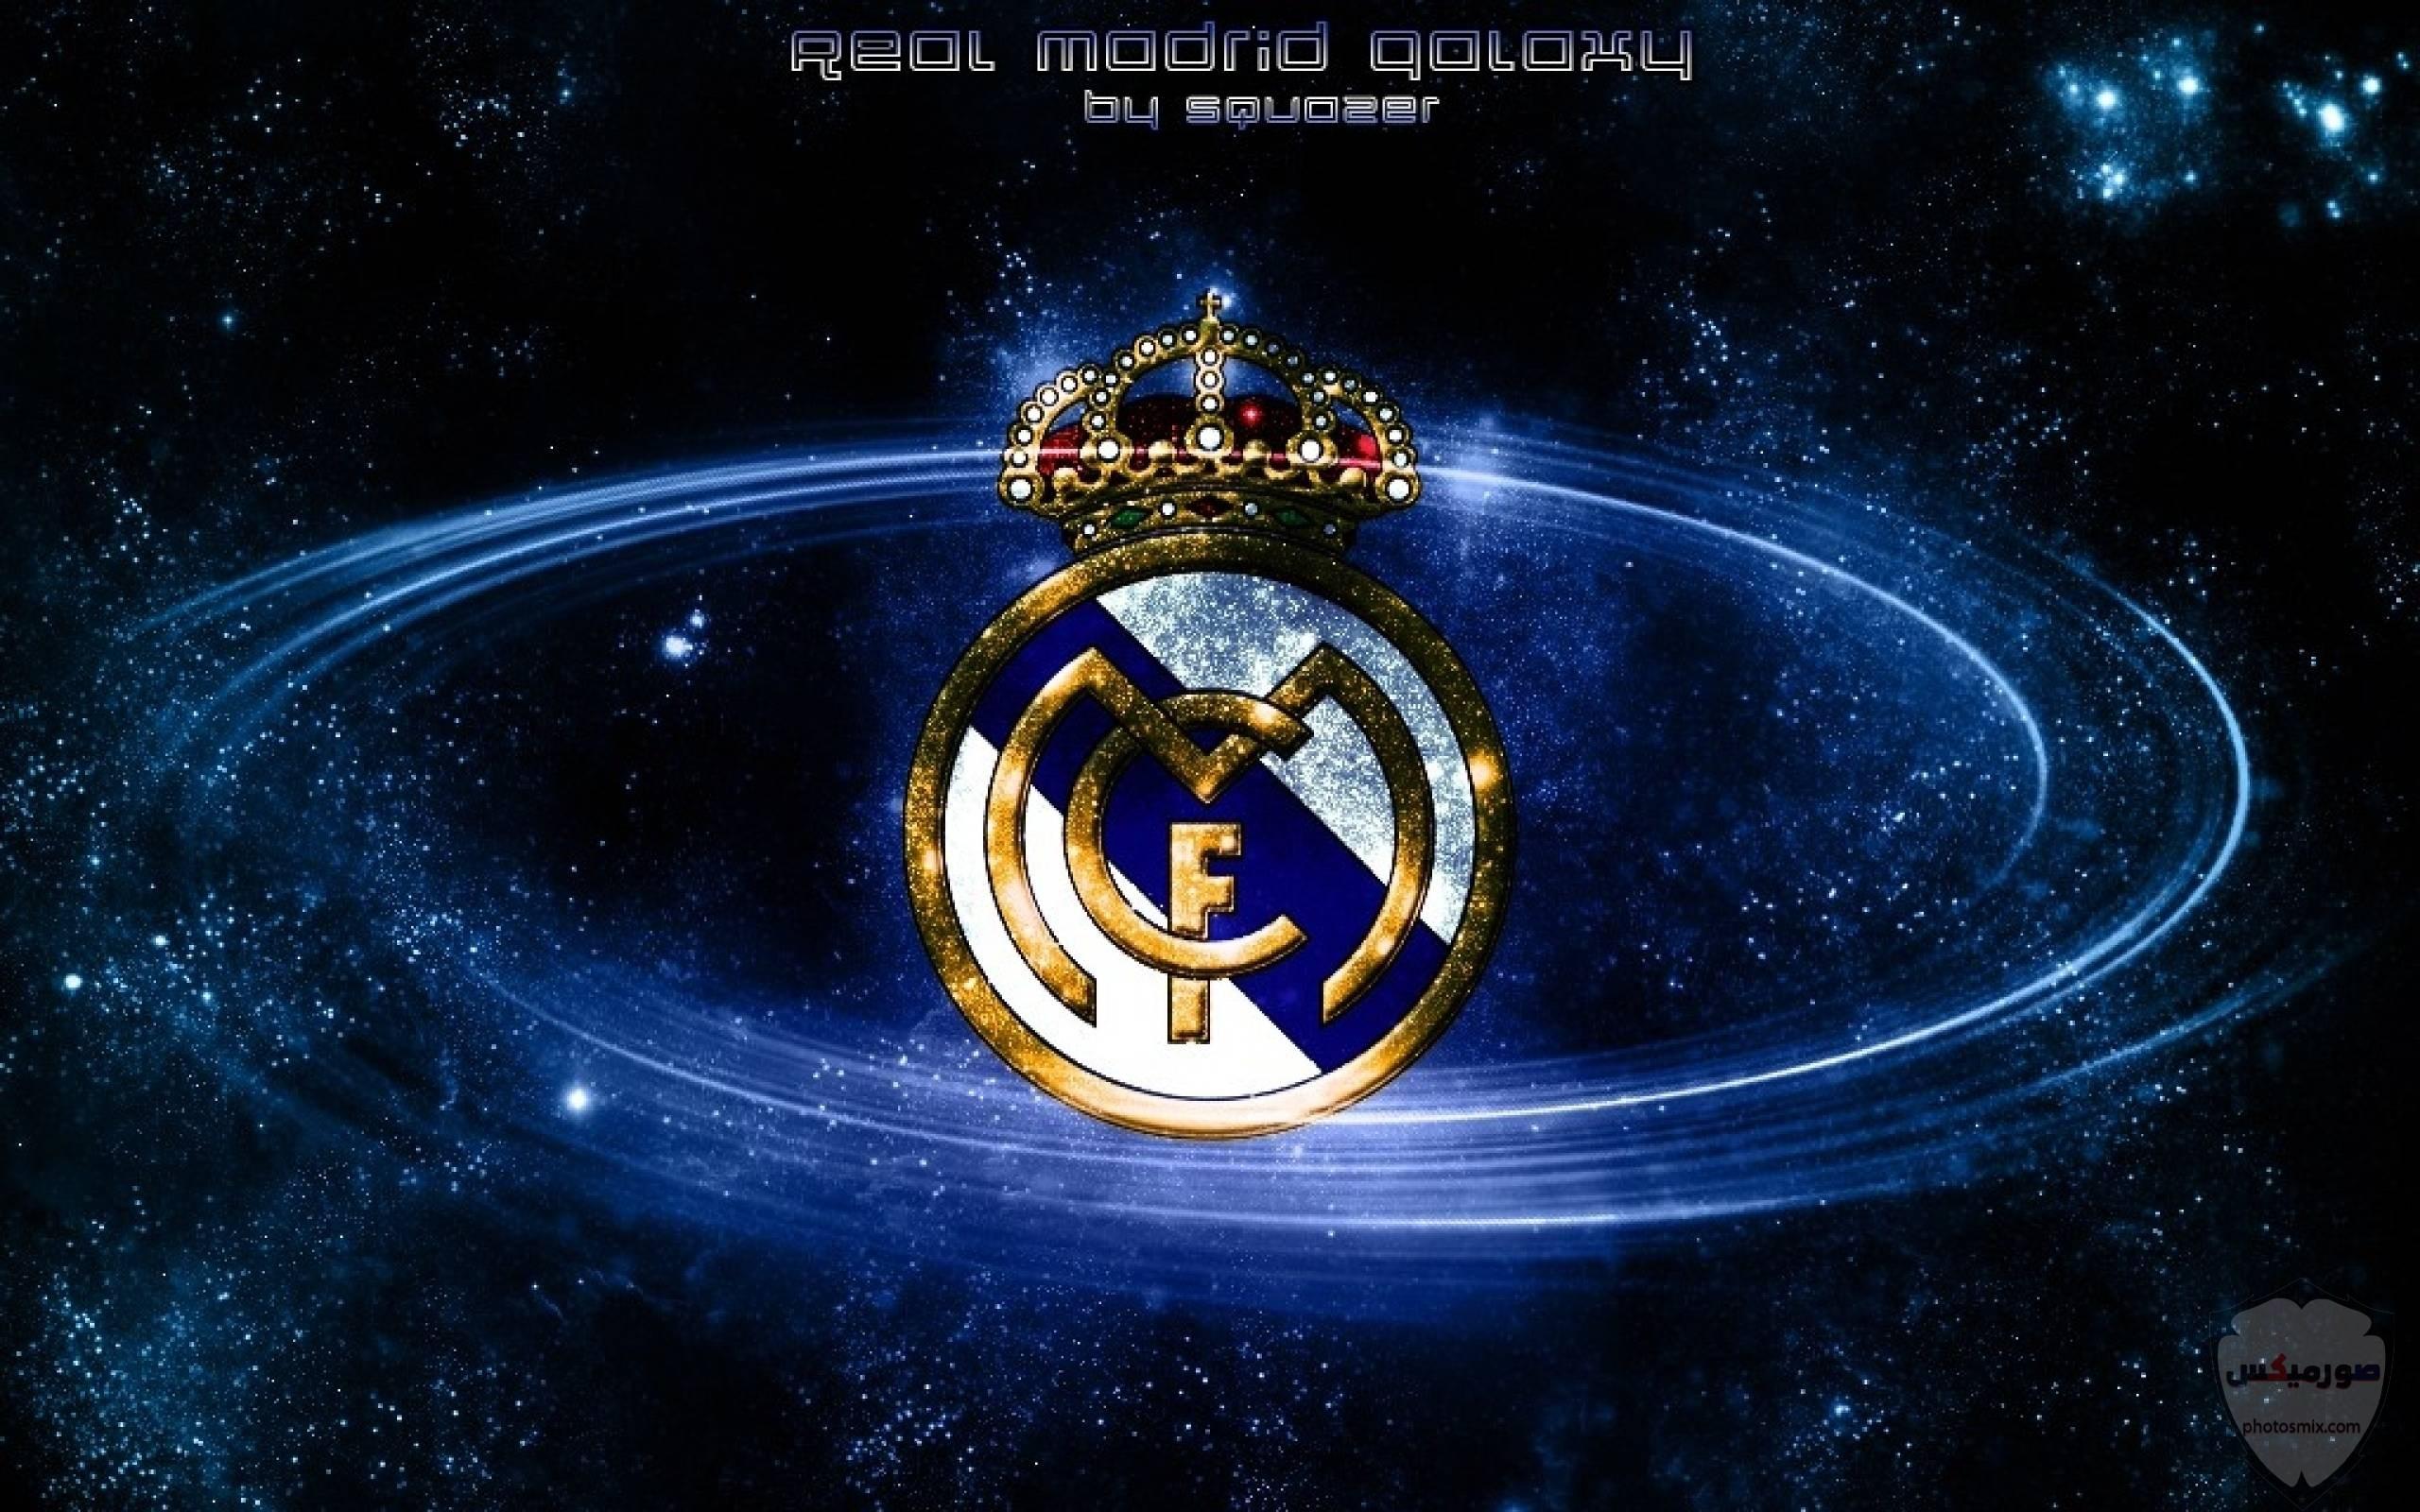 صور ريال مدريد 2020خلفيات ورمزيات ريال مدريد صور لاعبي ريال مدريد real madrid 34